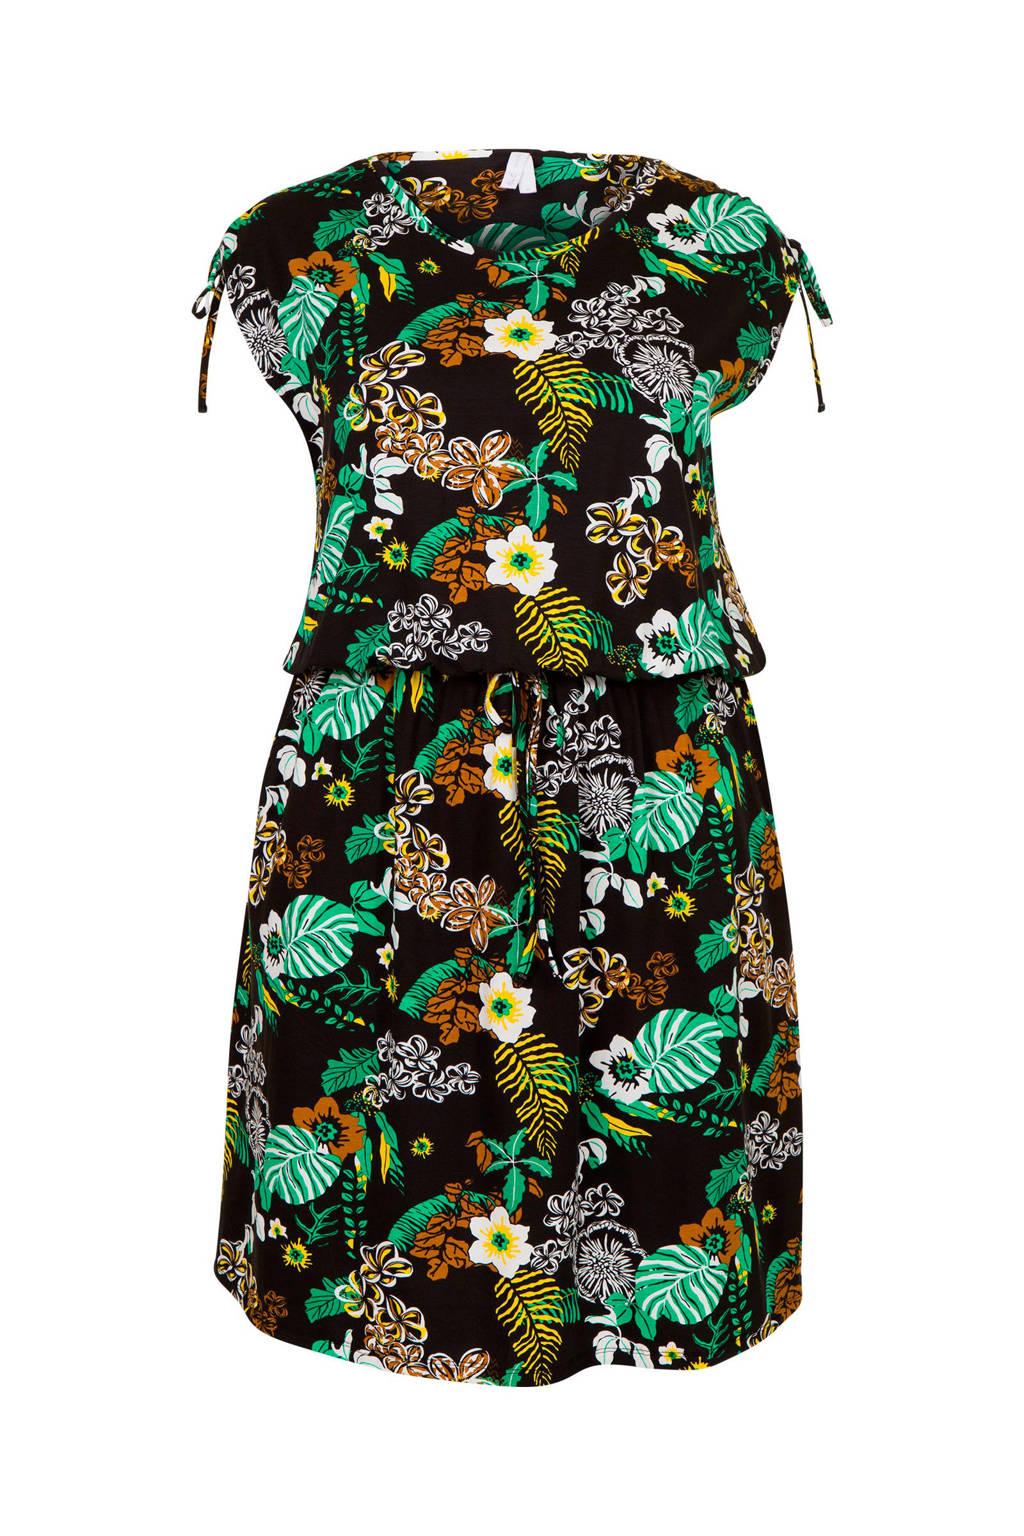 Miss Etam Plus gebloemde jurk, Zwart/groen